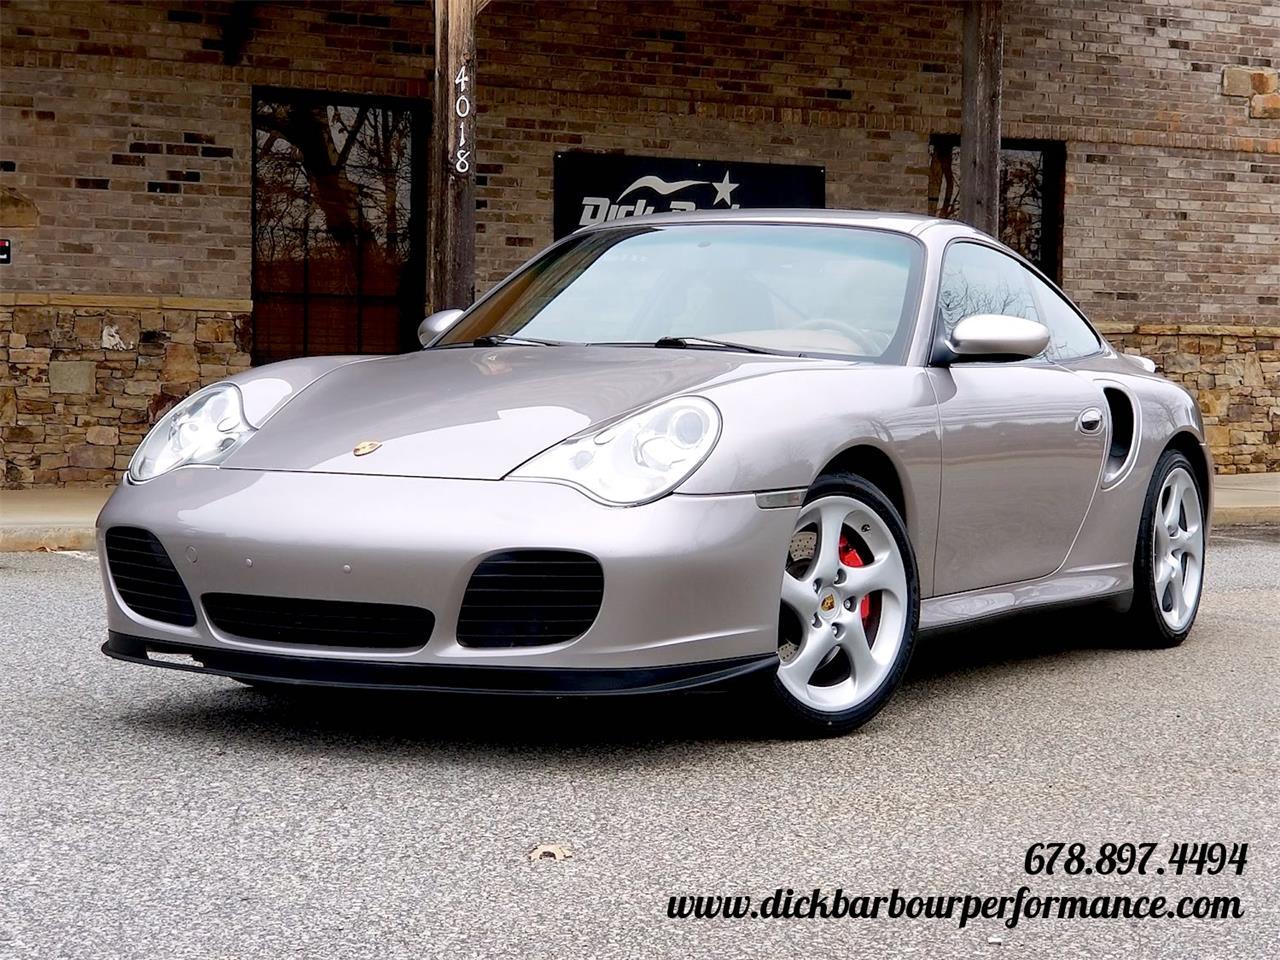 2001 Porsche 911 Turbo For Sale Classiccarscom Cc 1055287